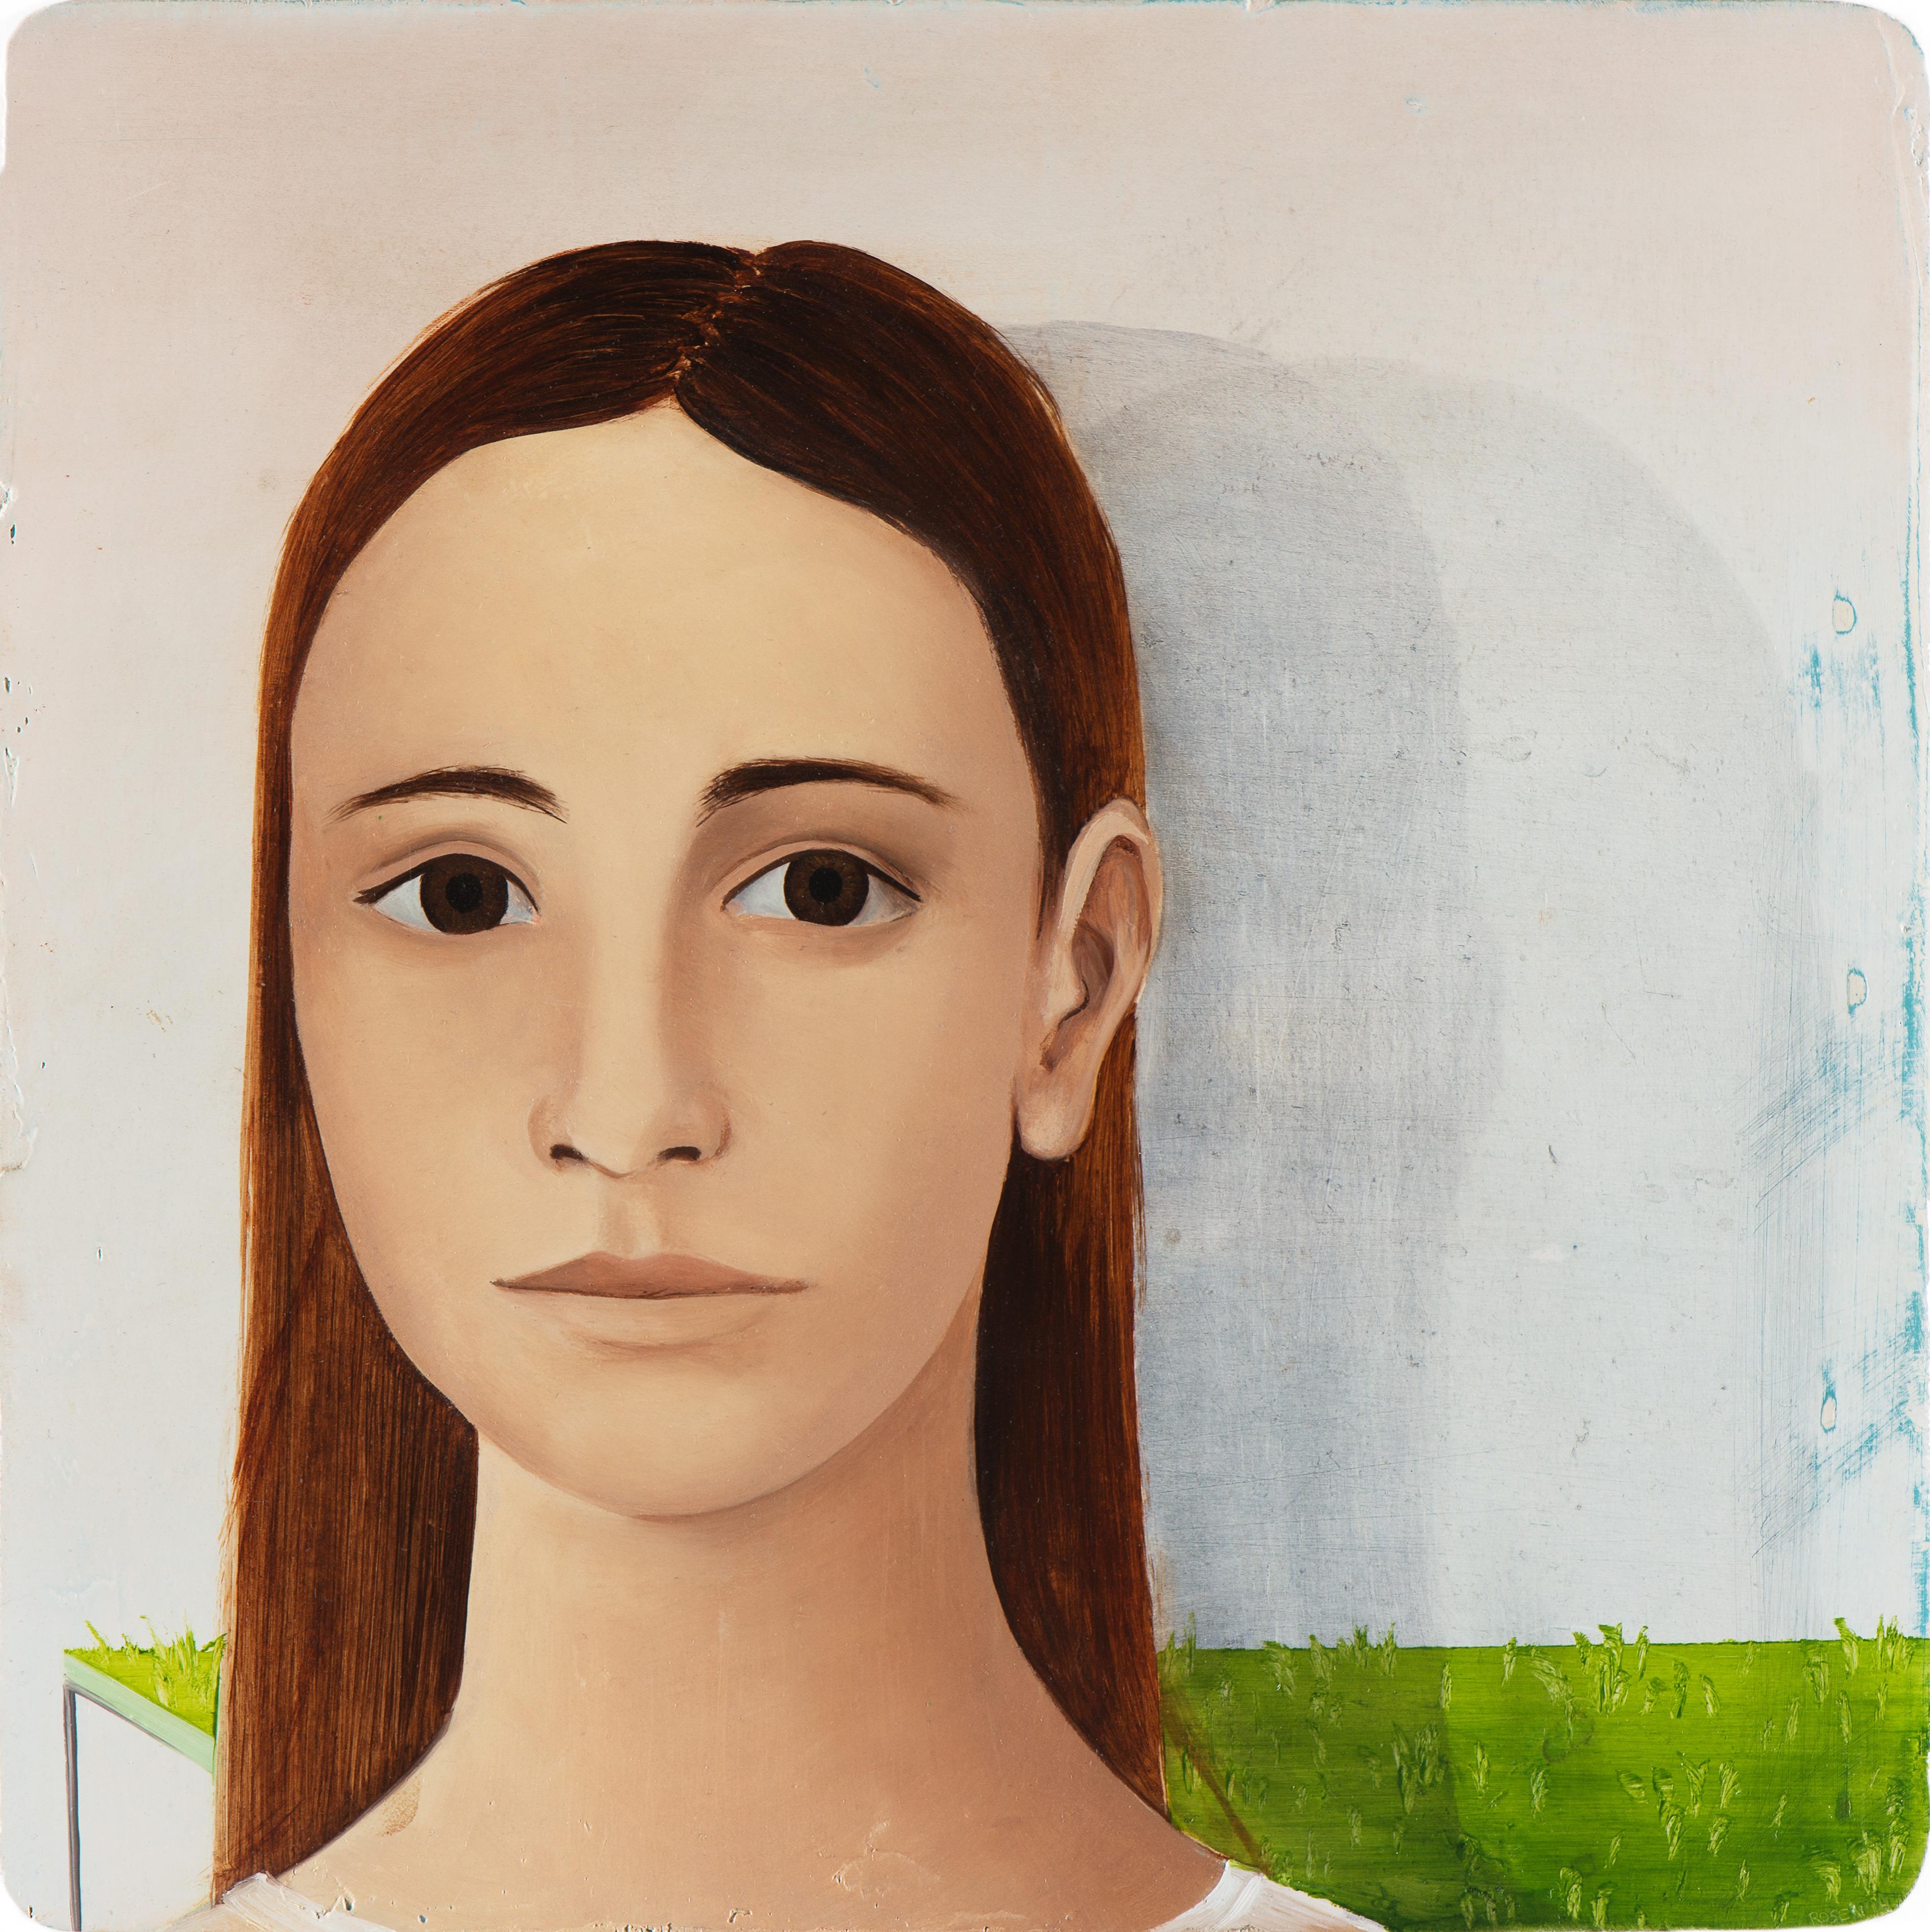 Untitled/20 x 20 cm, Oil on wood/2016